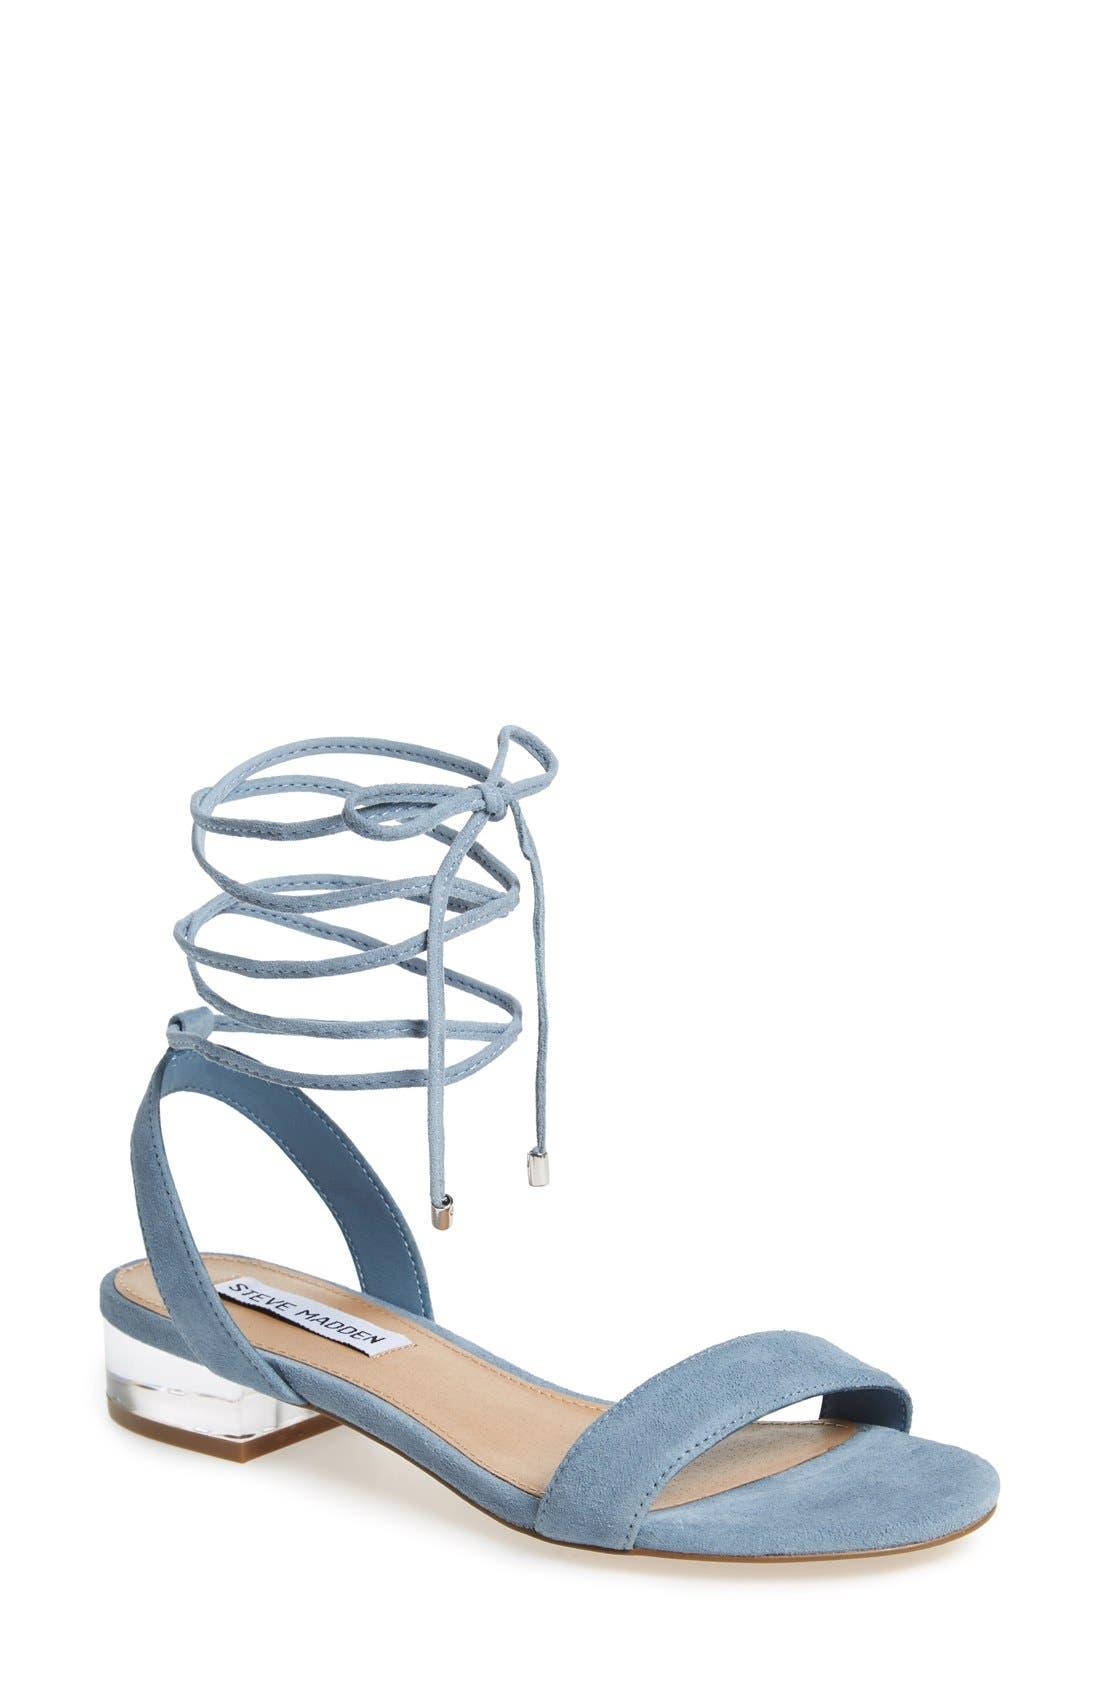 'Carolyn' Lace-Up Sandal,                             Main thumbnail 1, color,                             Blue Suede